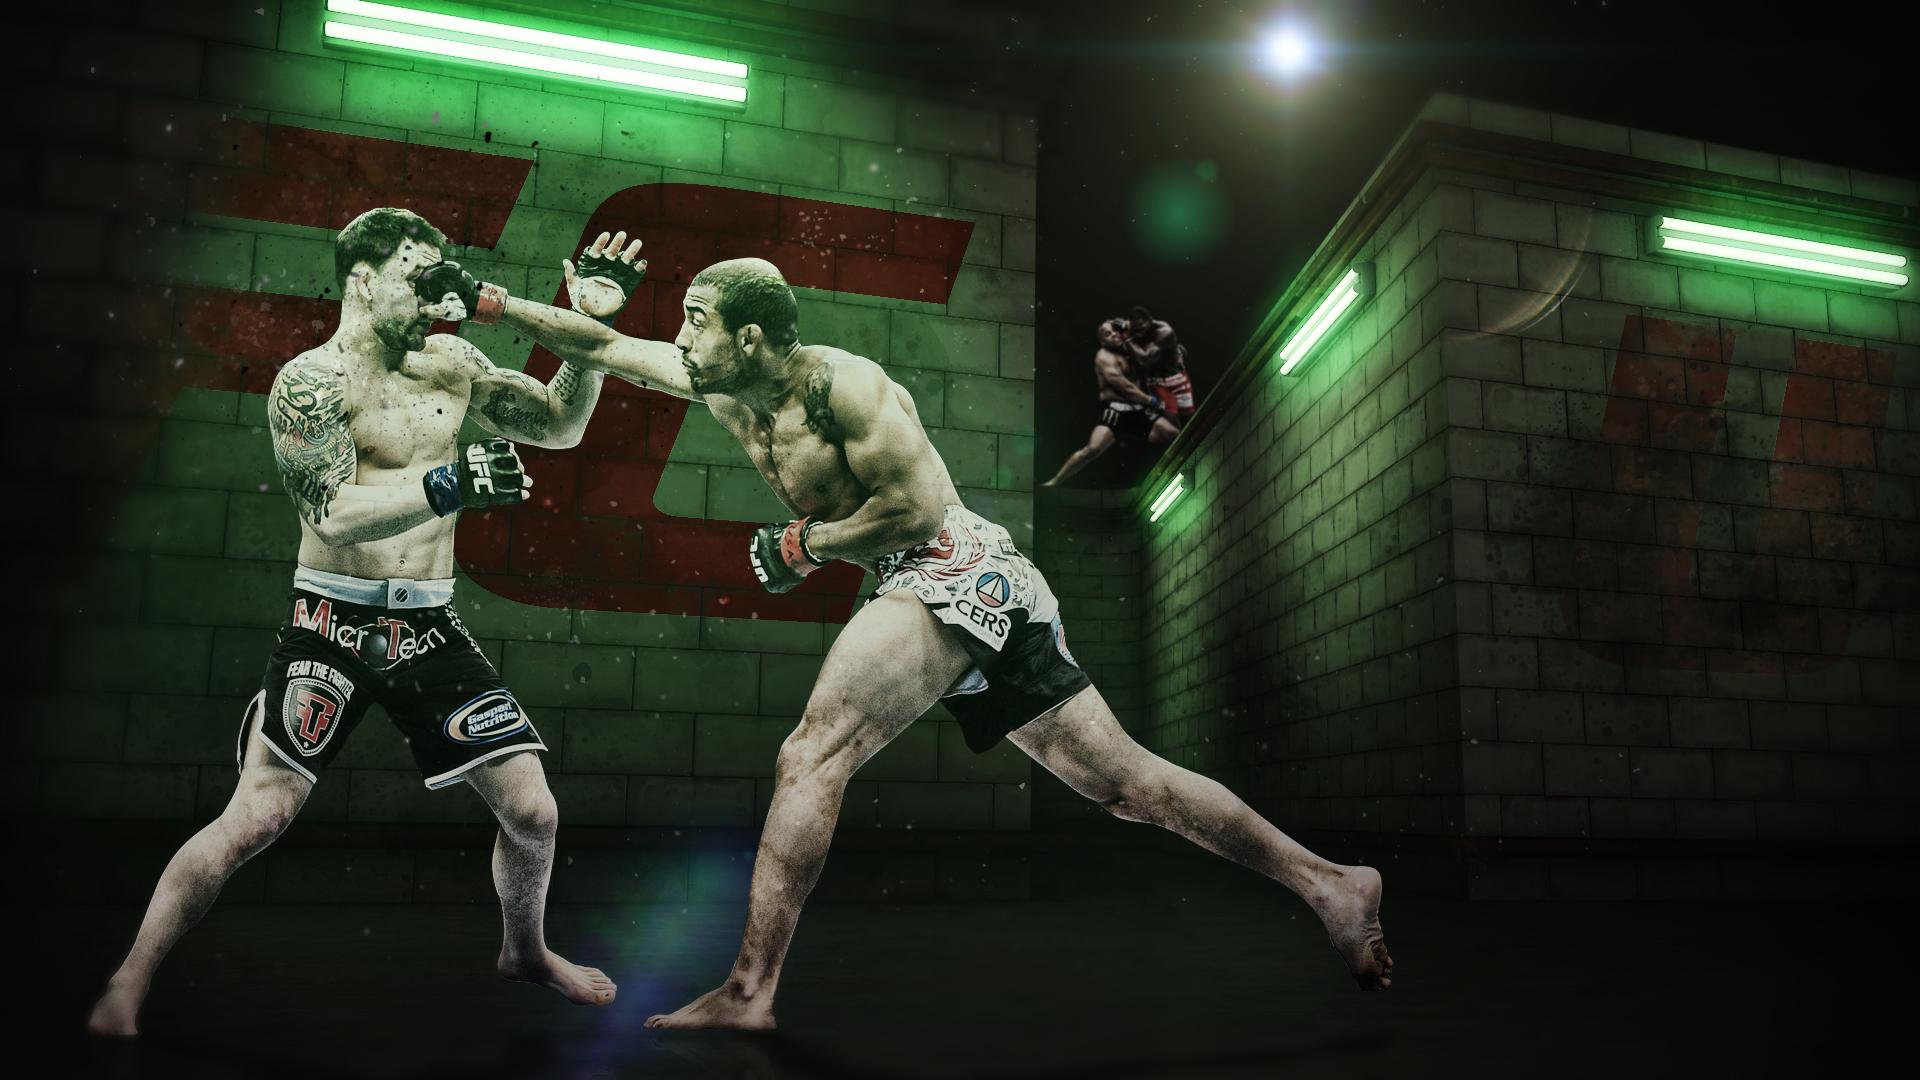 UFC_StyleFrameV2_Frame02_V2.jpg